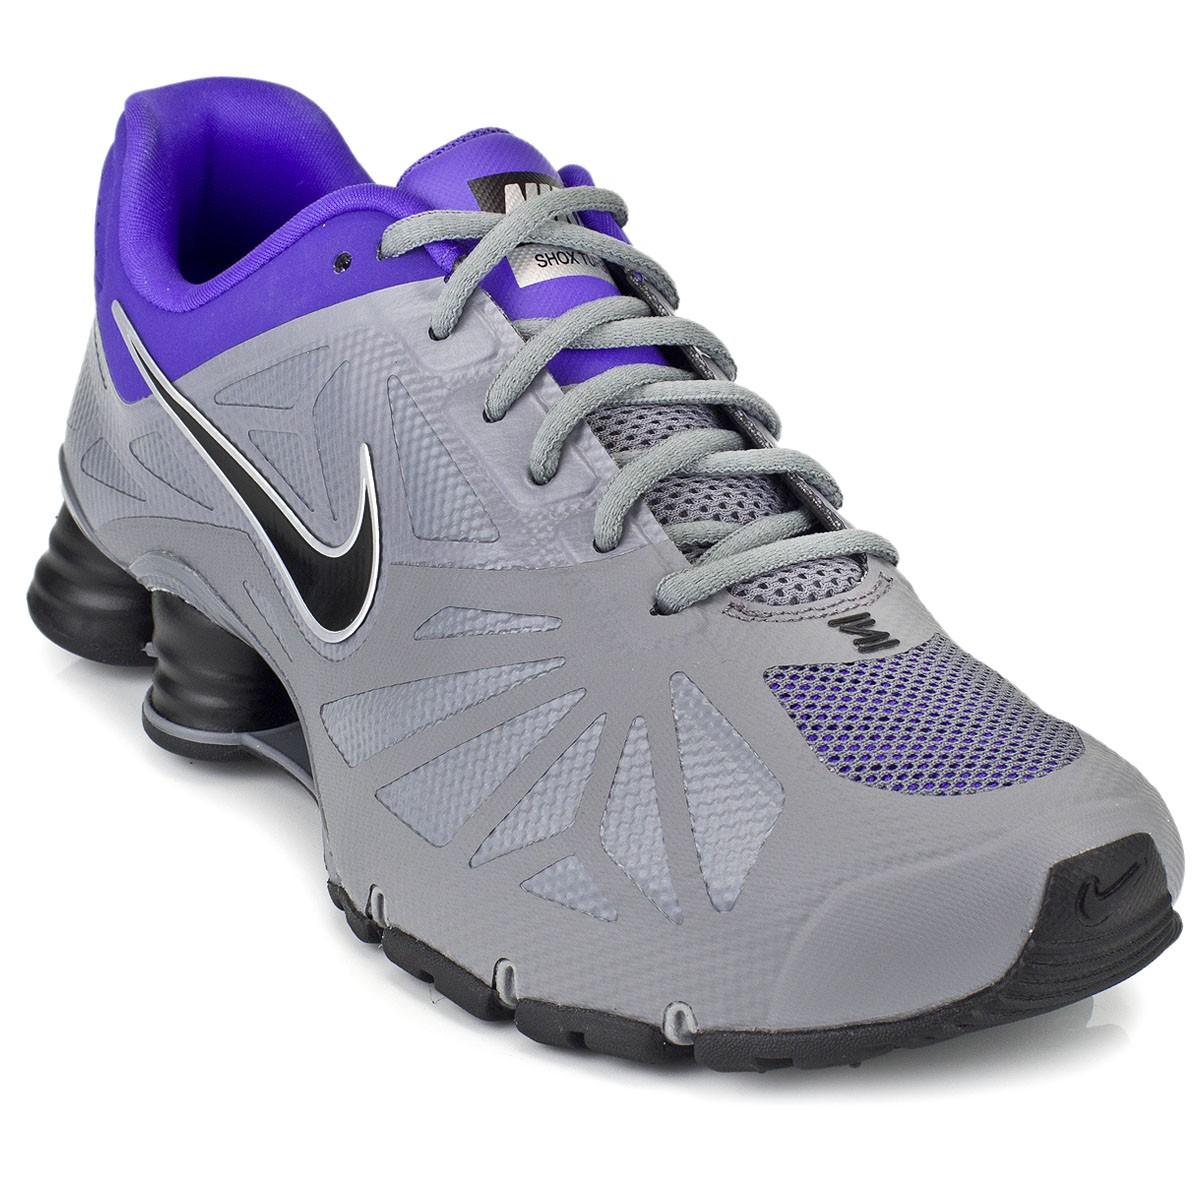 new styles 0124b d0b6a ... Carregando zoom buy c3422 c96f0 Tênis Nike Shox Turbo 14 631760 .